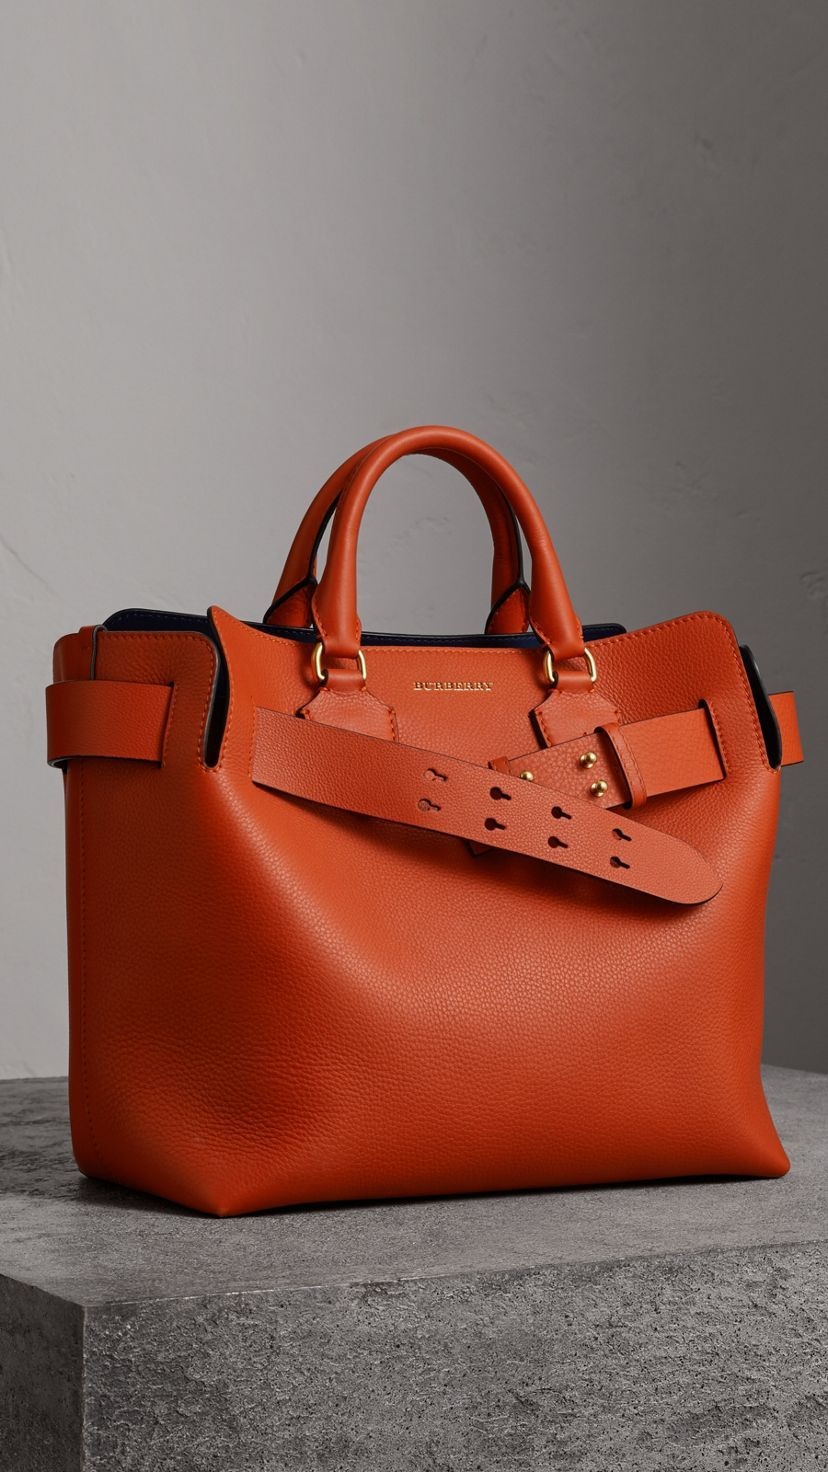 b9362f85c4e3 The Medium Leather Belt Bag in Clementine - Women in 2019